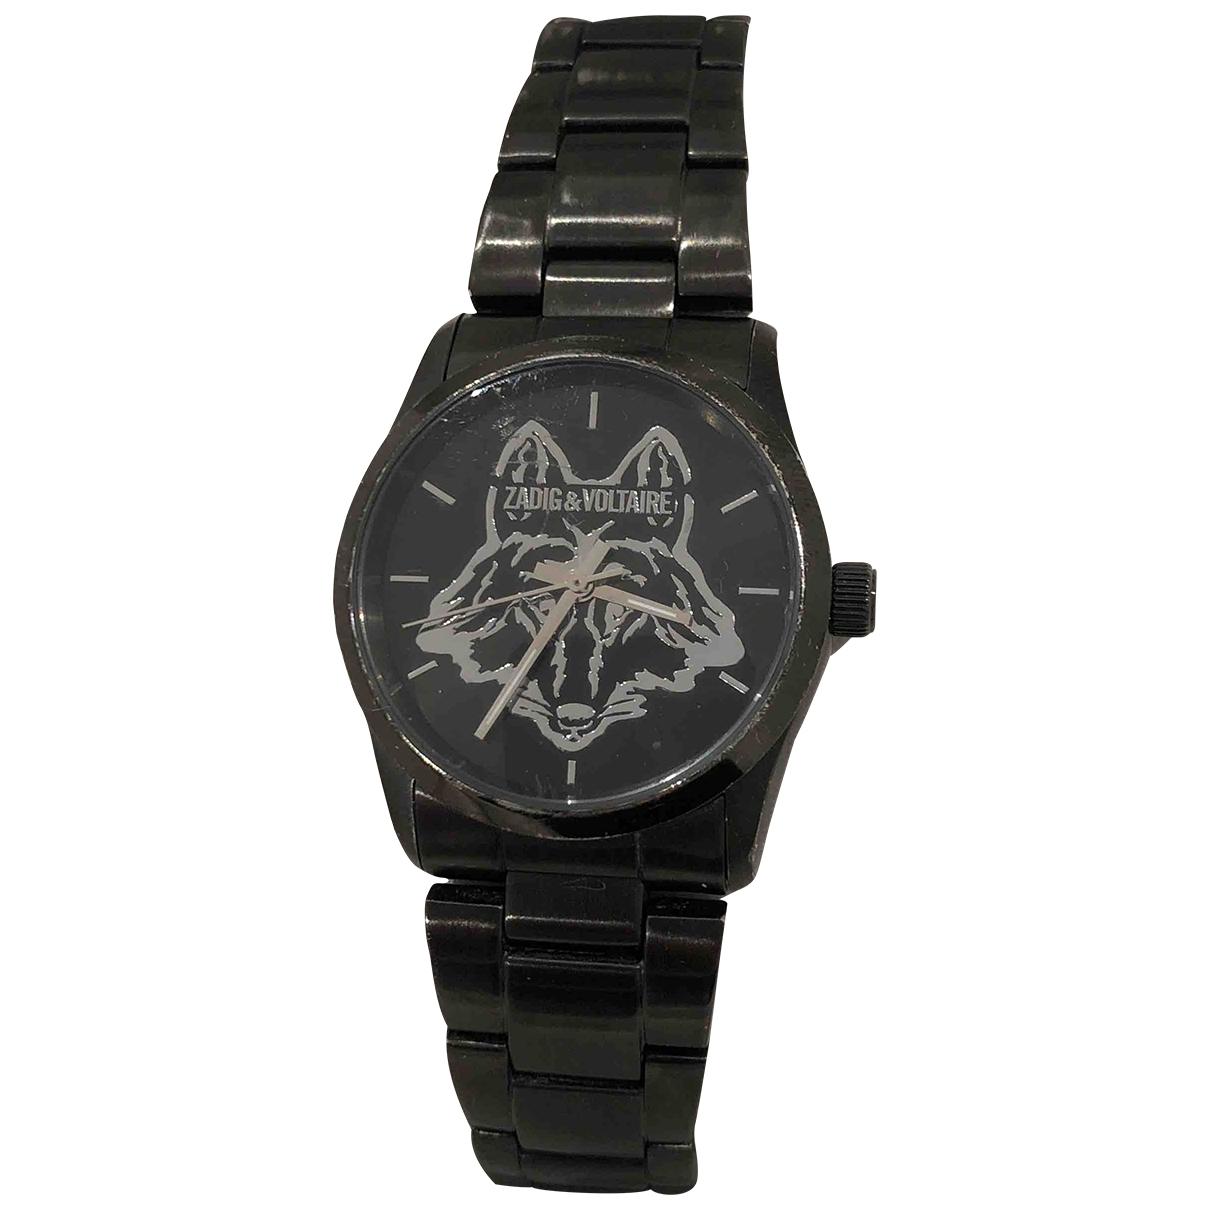 Zadig & Voltaire \N Black Steel watch for Women \N